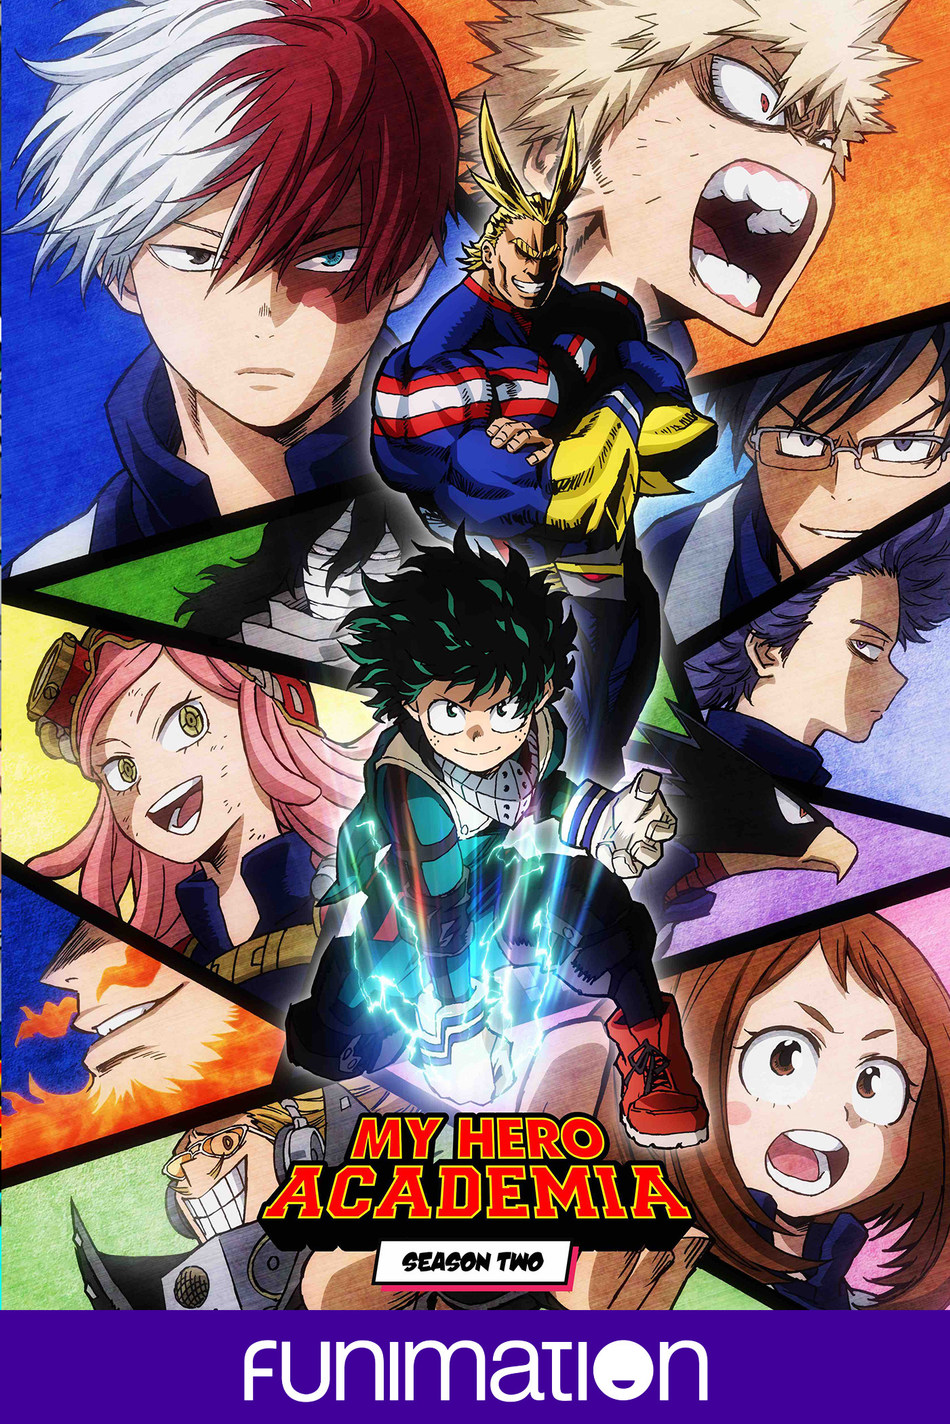 """My Hero Academia"" Season 2 official poster art. Courtesy Funimation Entertainment."